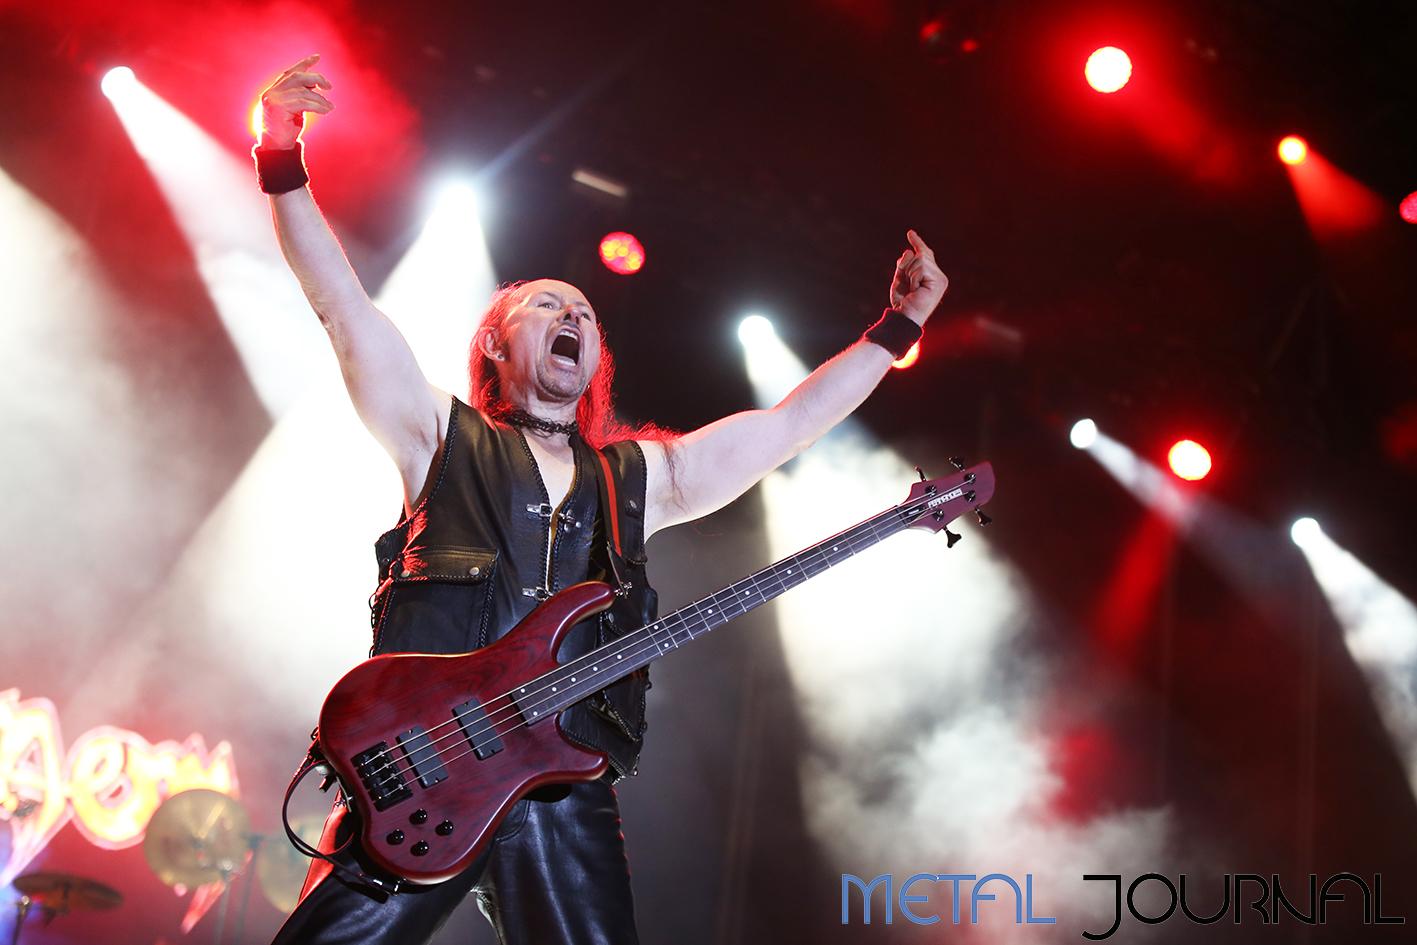 venom - metal journal rock fest barcelona 2019 pic 2